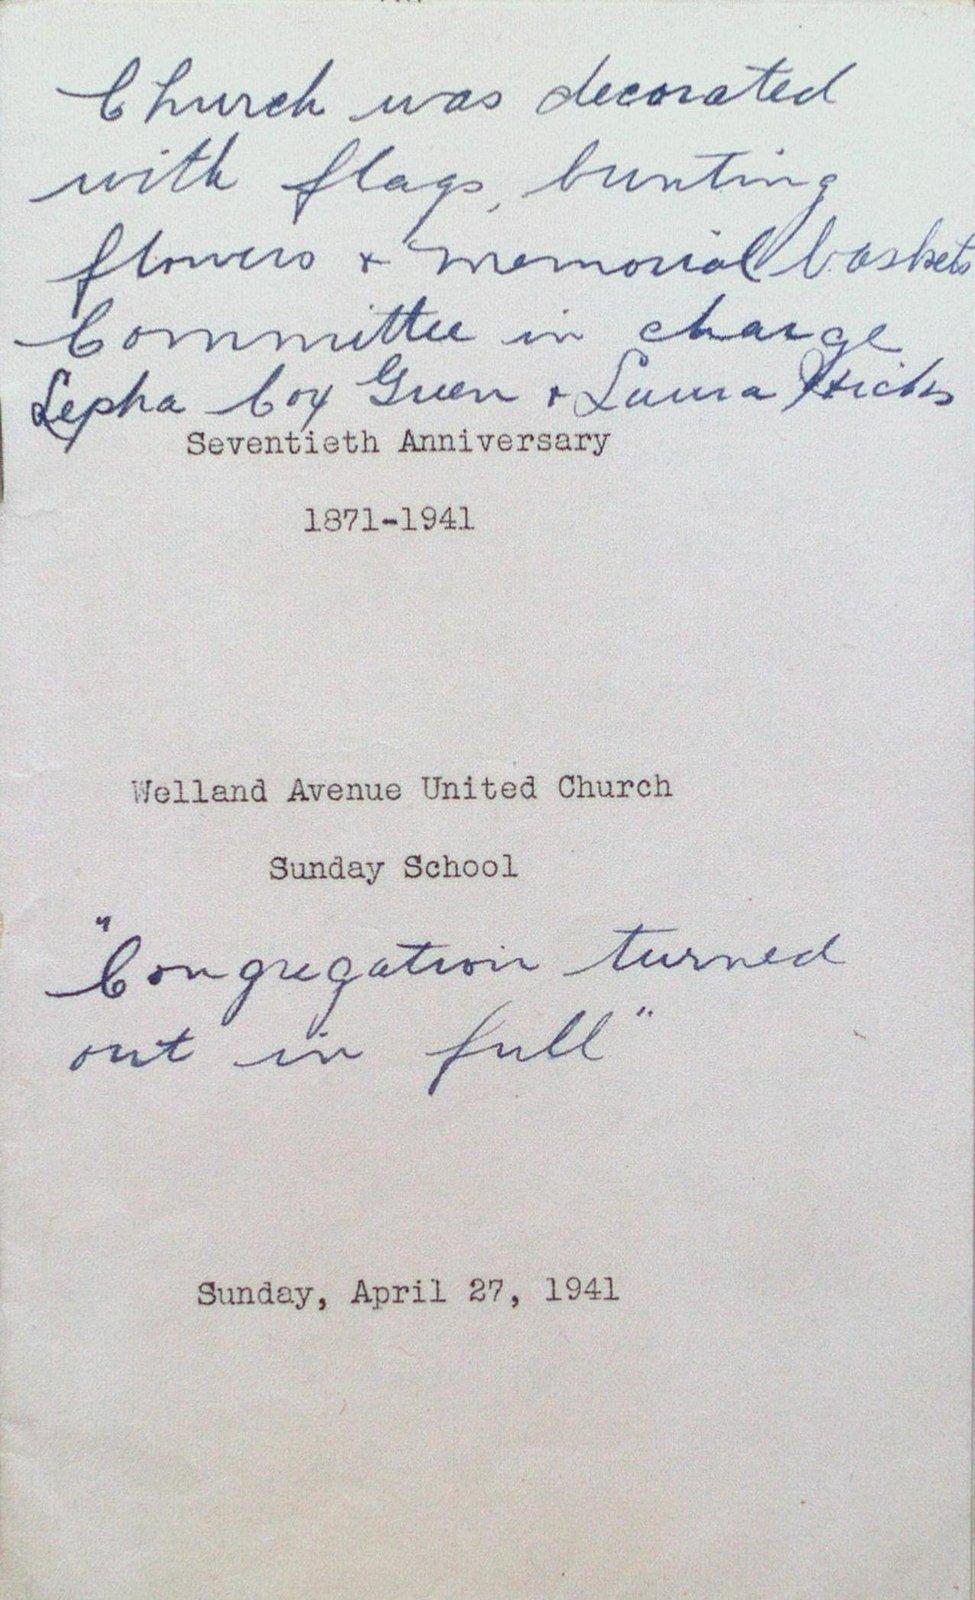 Welland Avenue United Church 70th Anniversary Celebrations